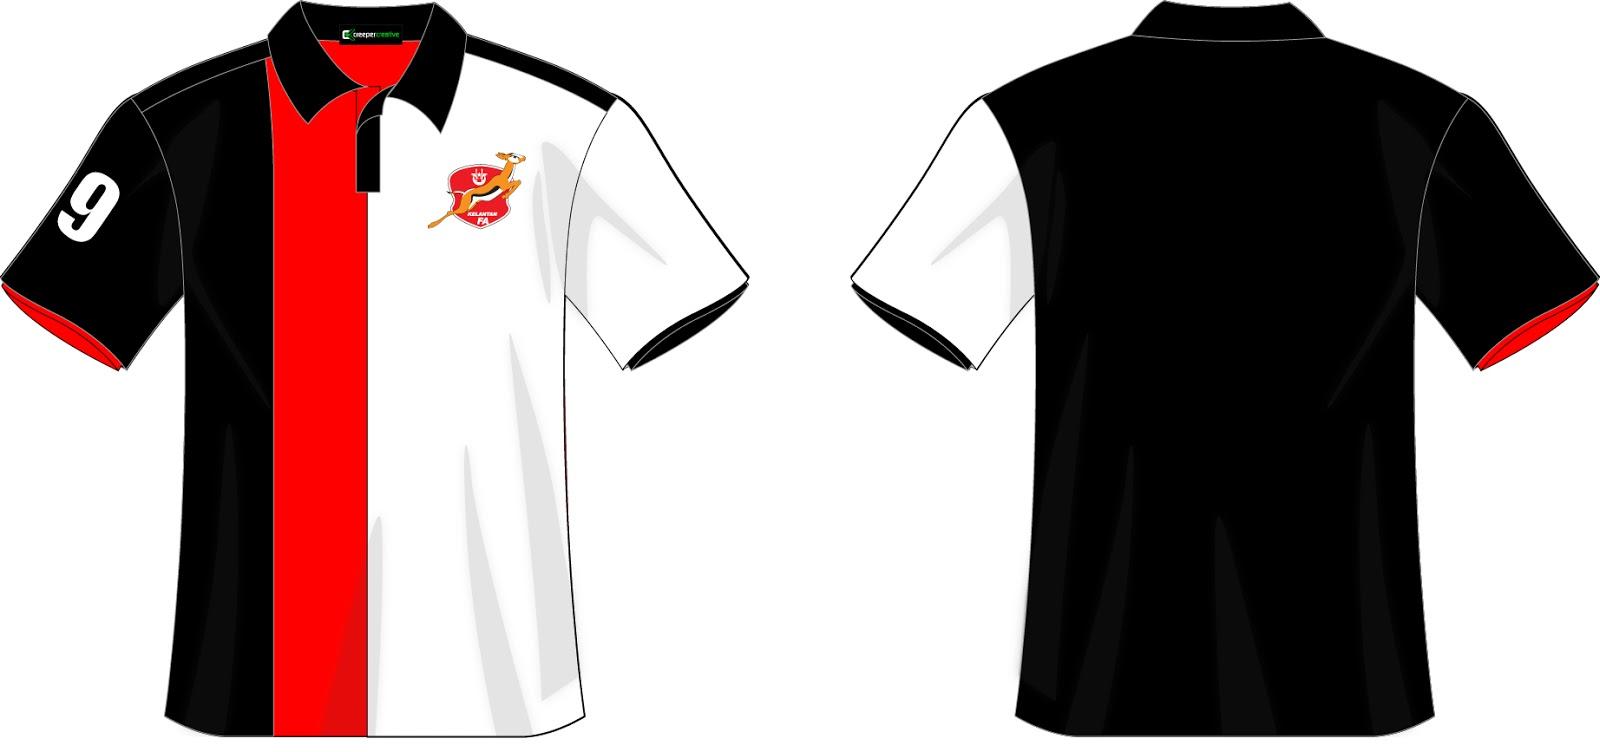 Desain t shirt kerah - United Arab Emirates 100 Polo T Shirt United Arab Emirates 100 Polo T Shirt Manufacturers And Suppliers On Alibaba Com